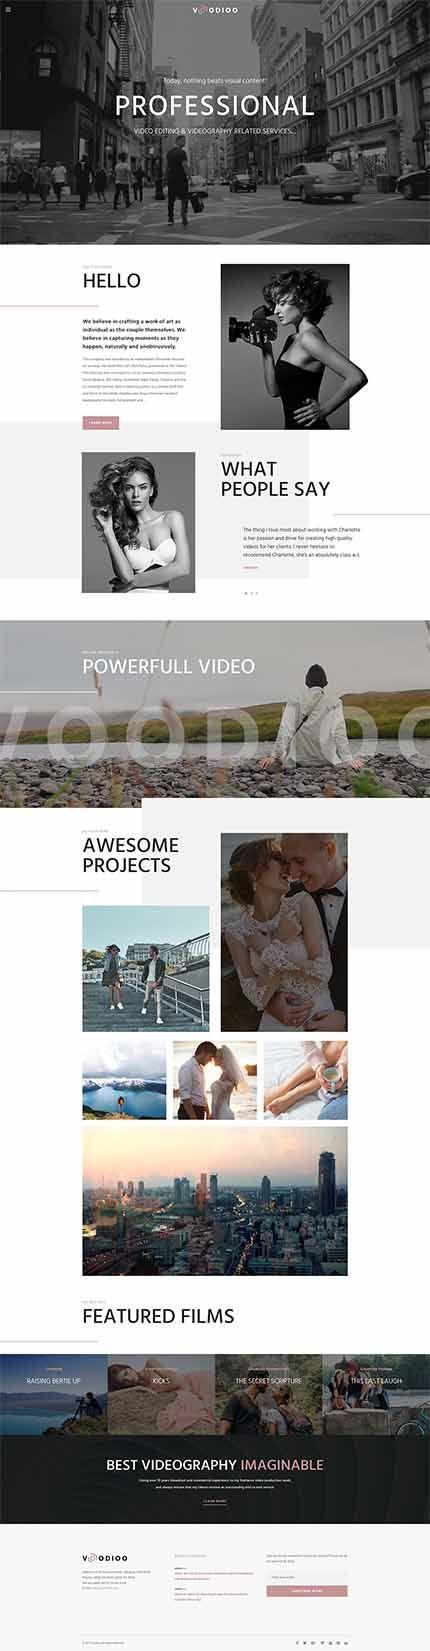 Voodioo - Videographer Responsive WordPress Theme WordPress Theme ...